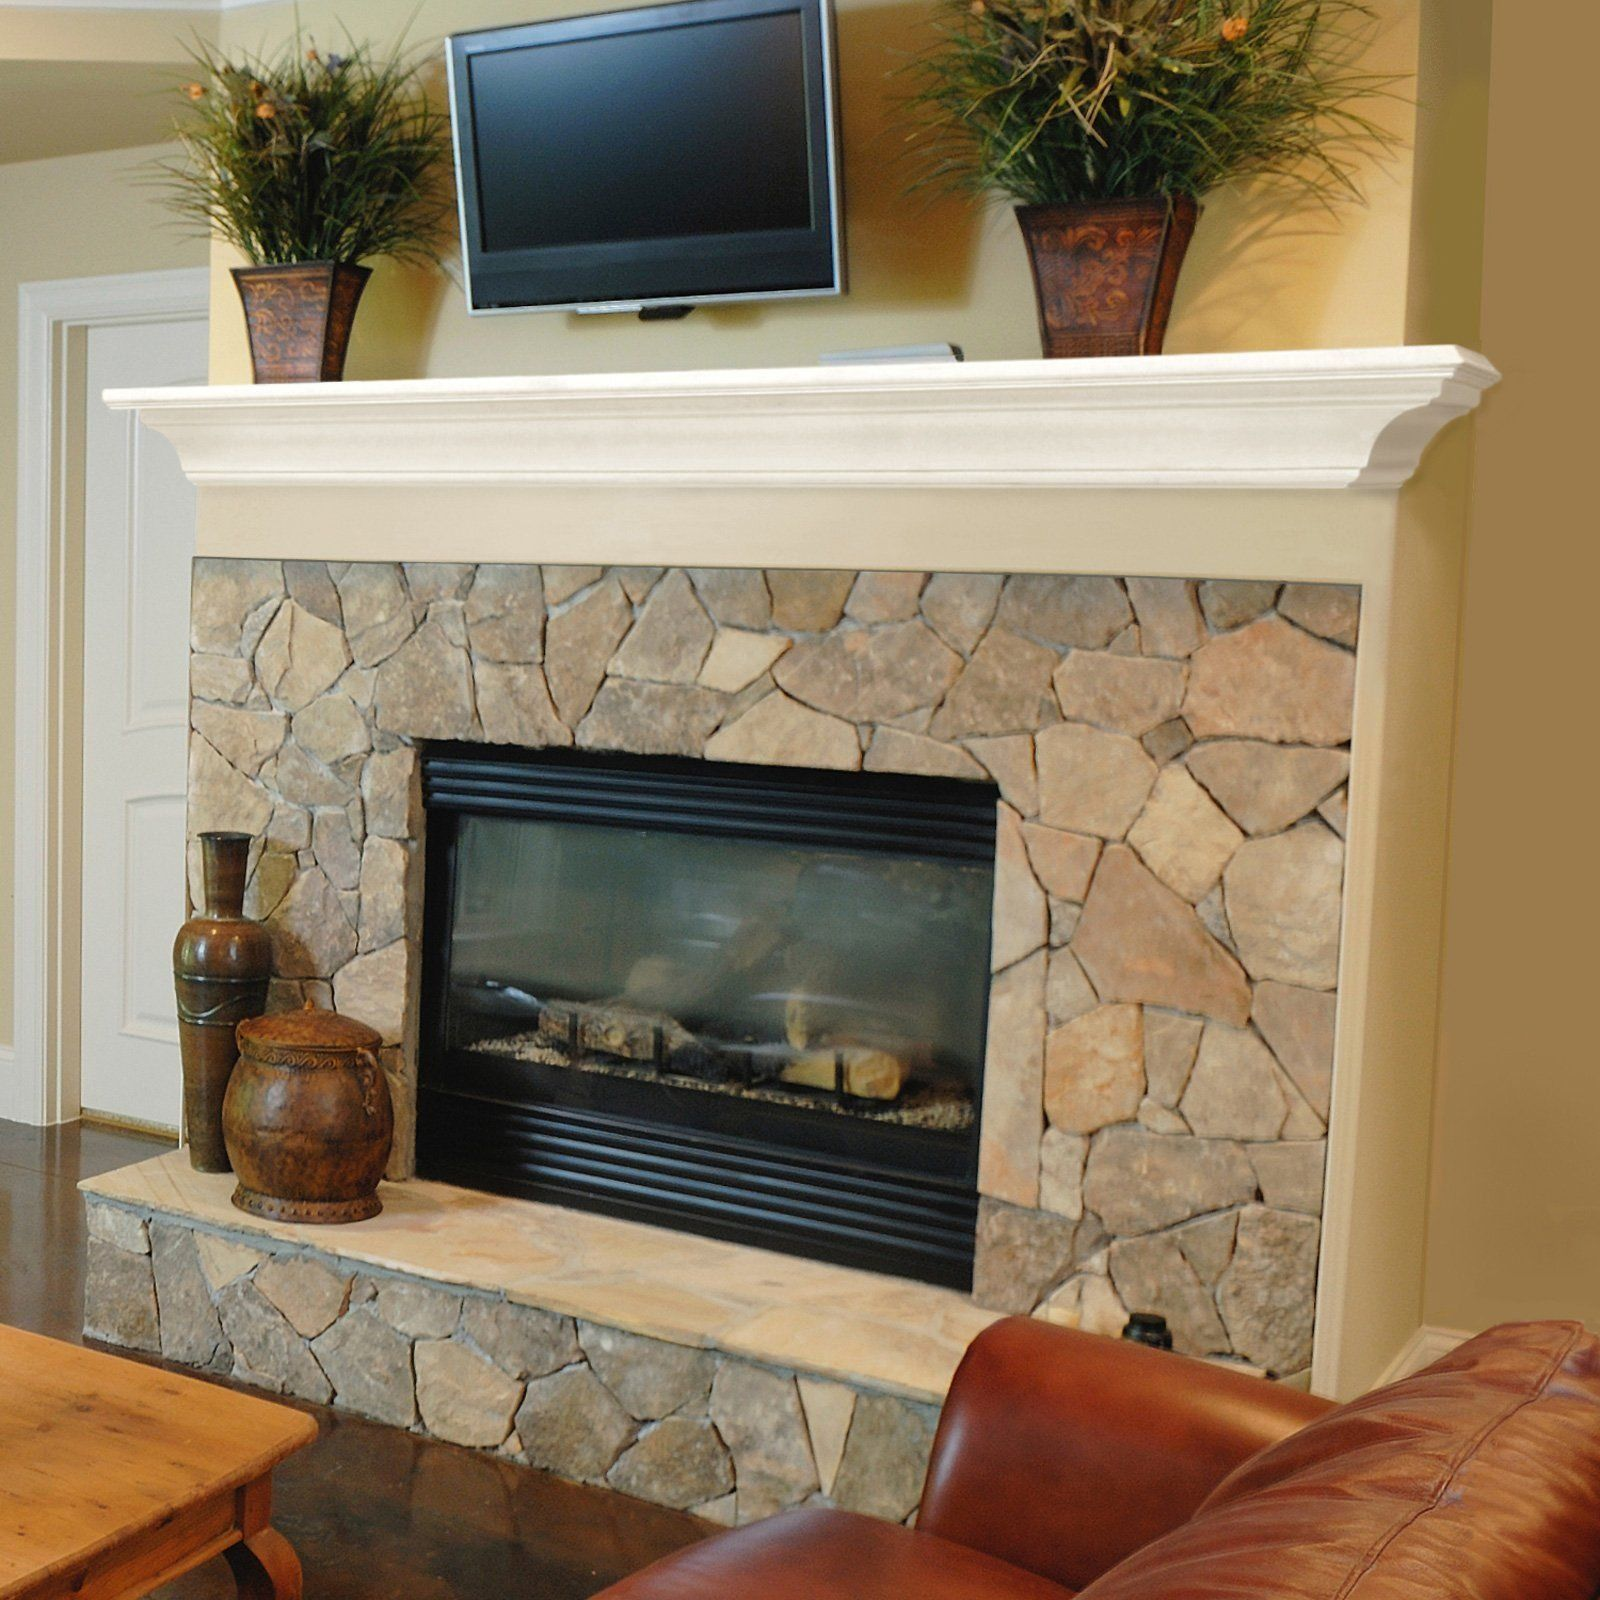 Wooden Fireplace Mantel Shelf Fresh Painted Wooden White Fireplace Mantel Shelf In 2019